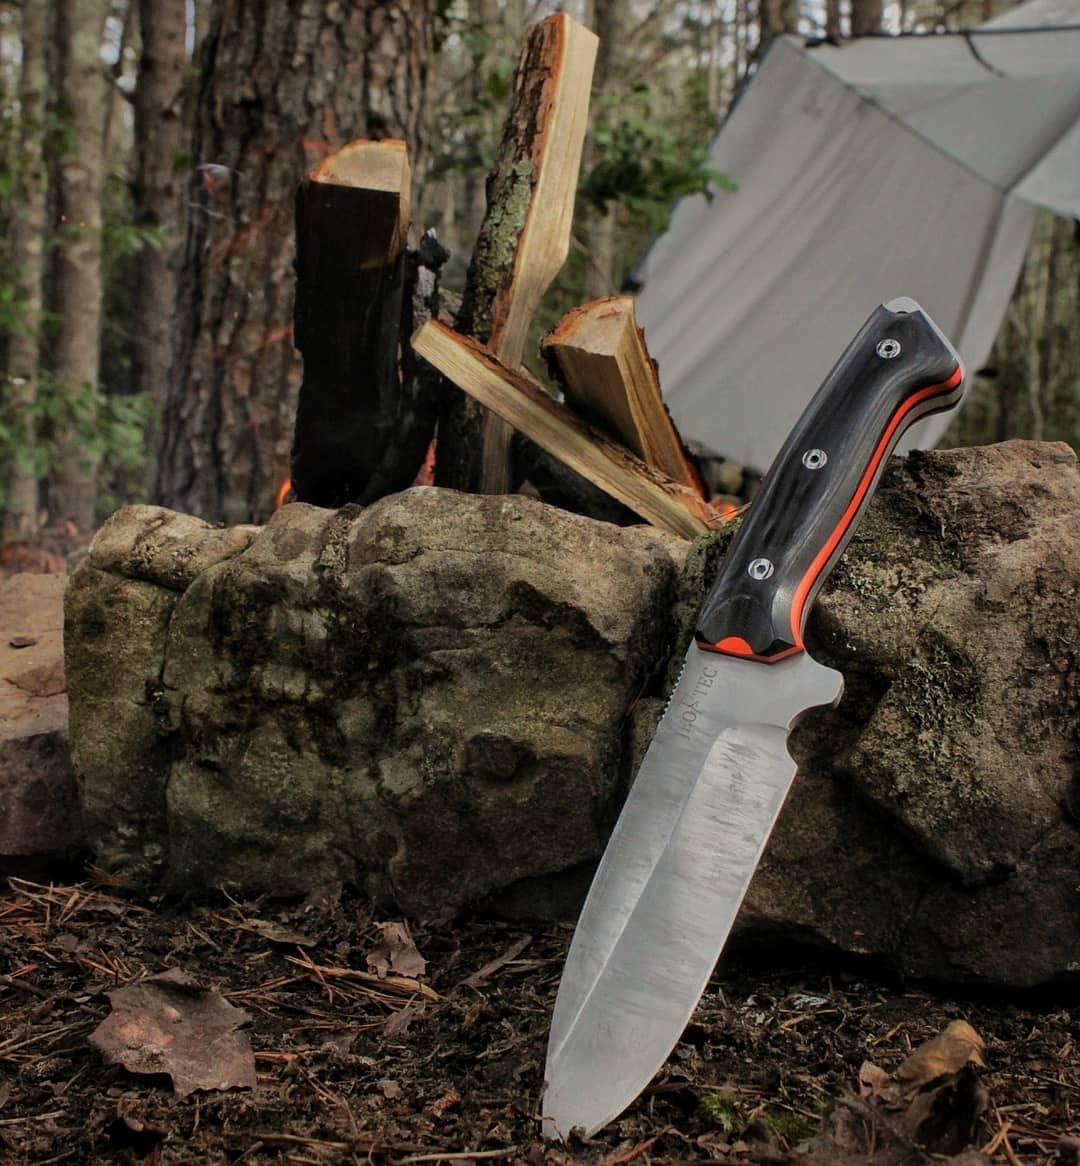 JEO-TEC-No39-Celtibero-Knife-Post-Image